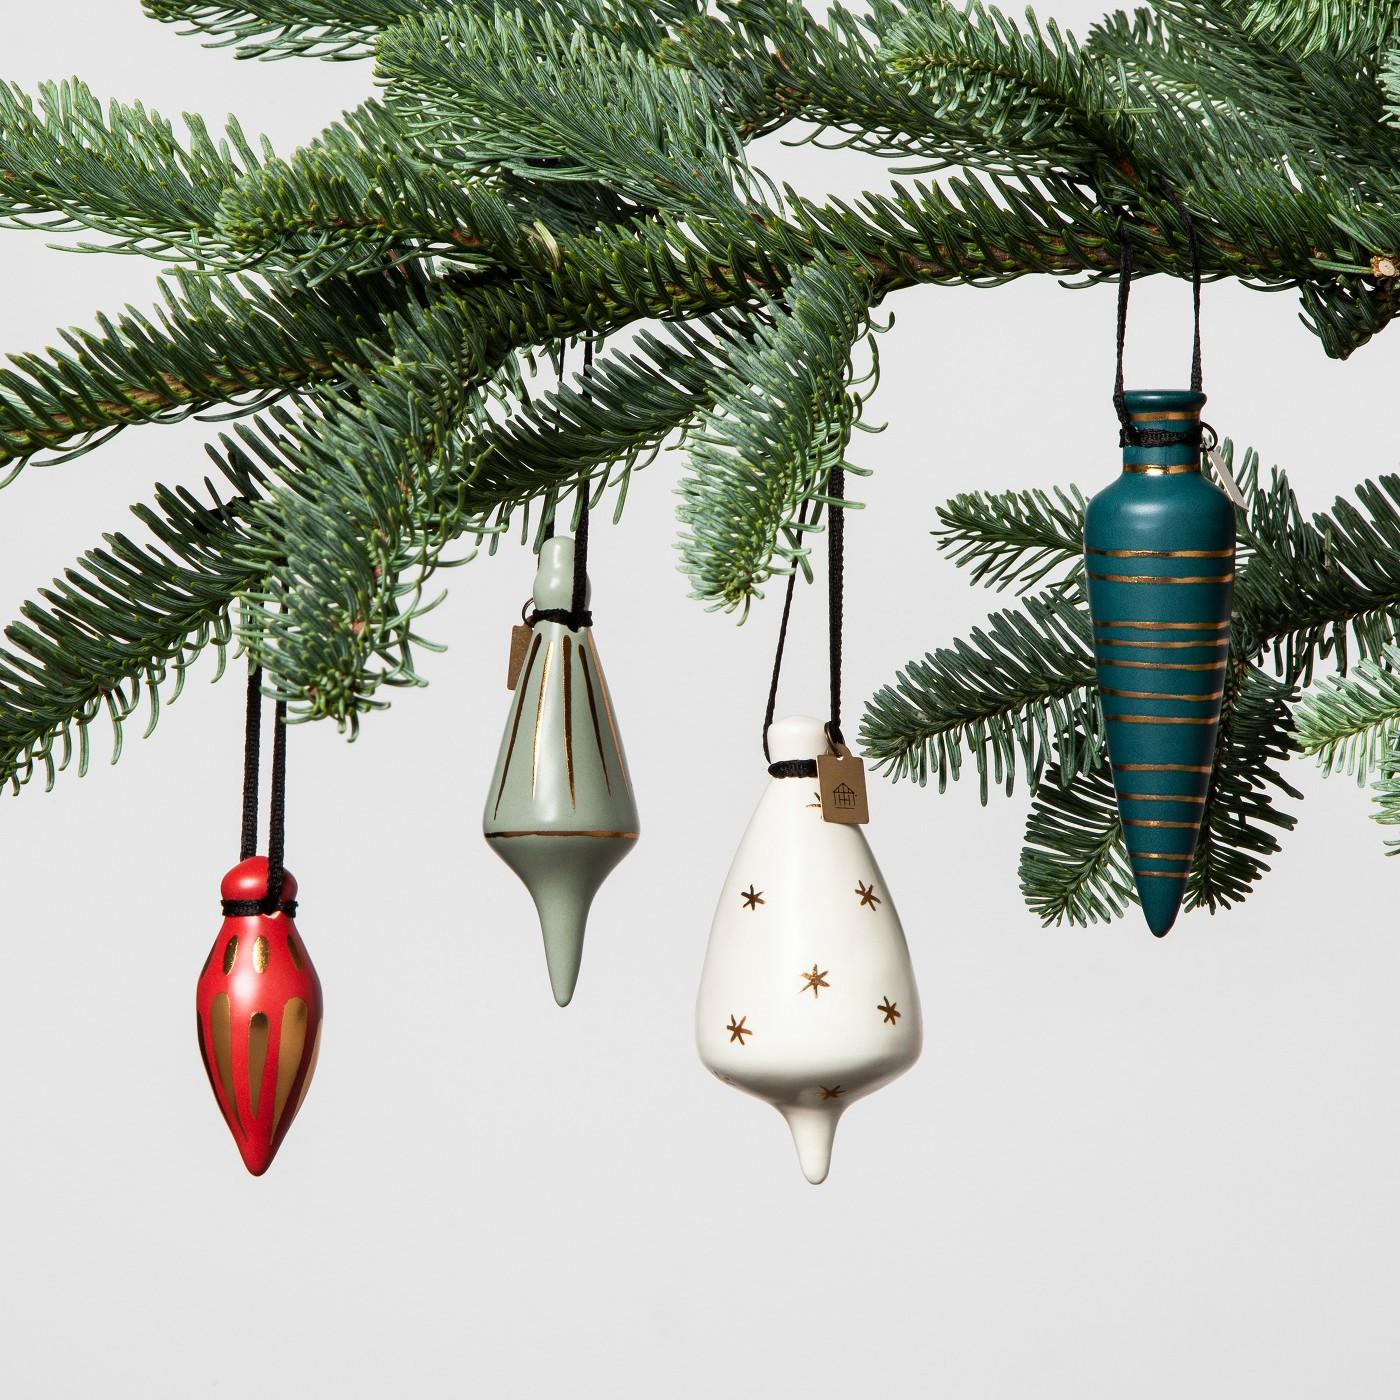 best holiday decor tree ornaments